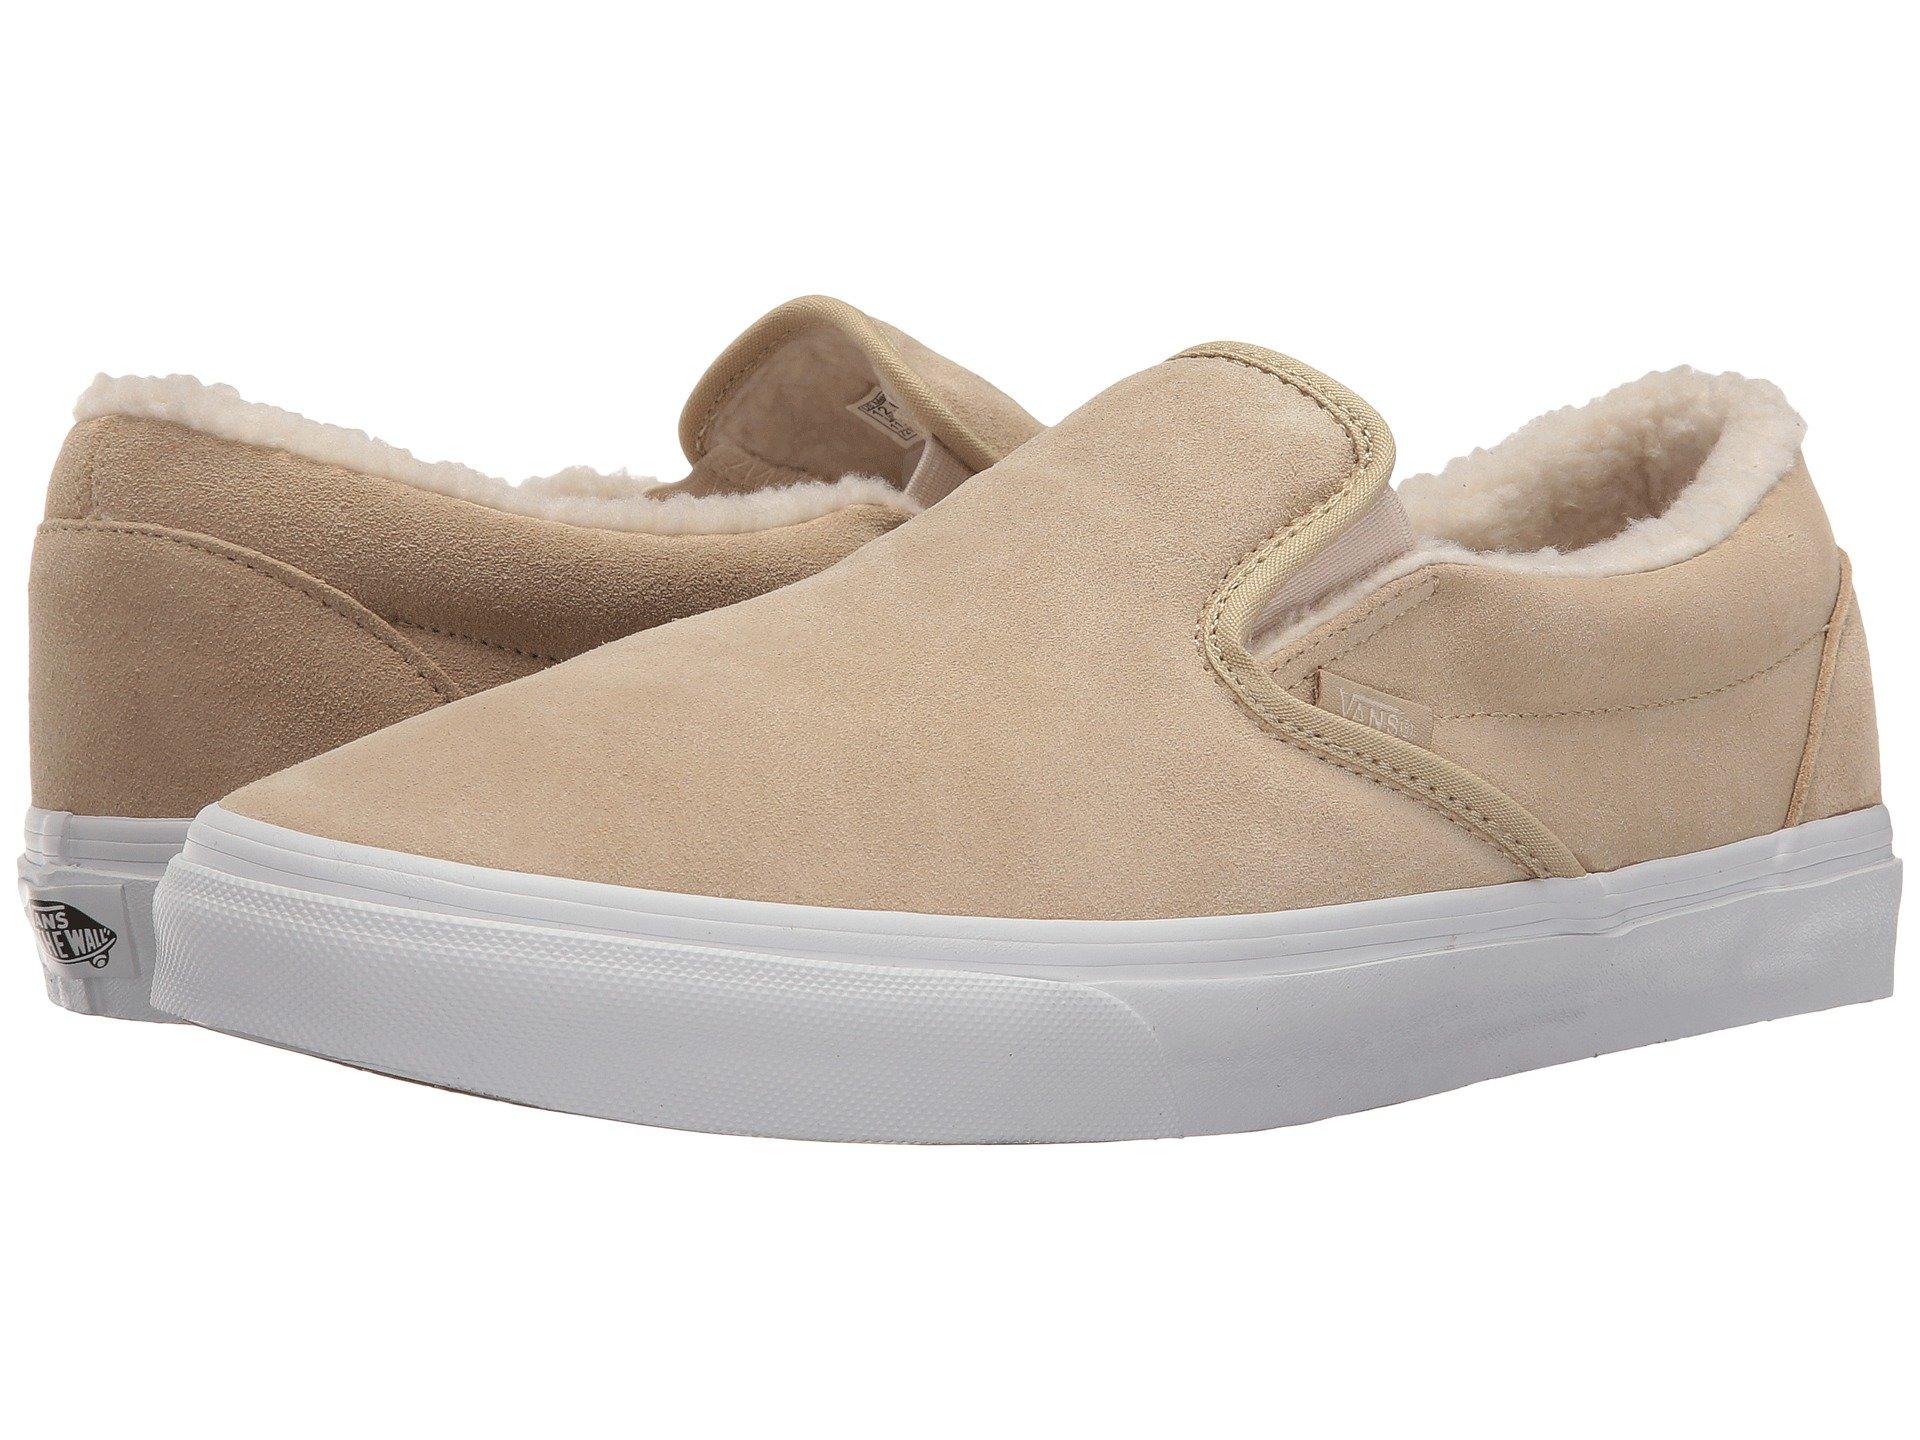 959058da05 Galleon - Vans Classic Slip On Suede Fleece Khaki True White Men s Skate  Shoes Size 8.5